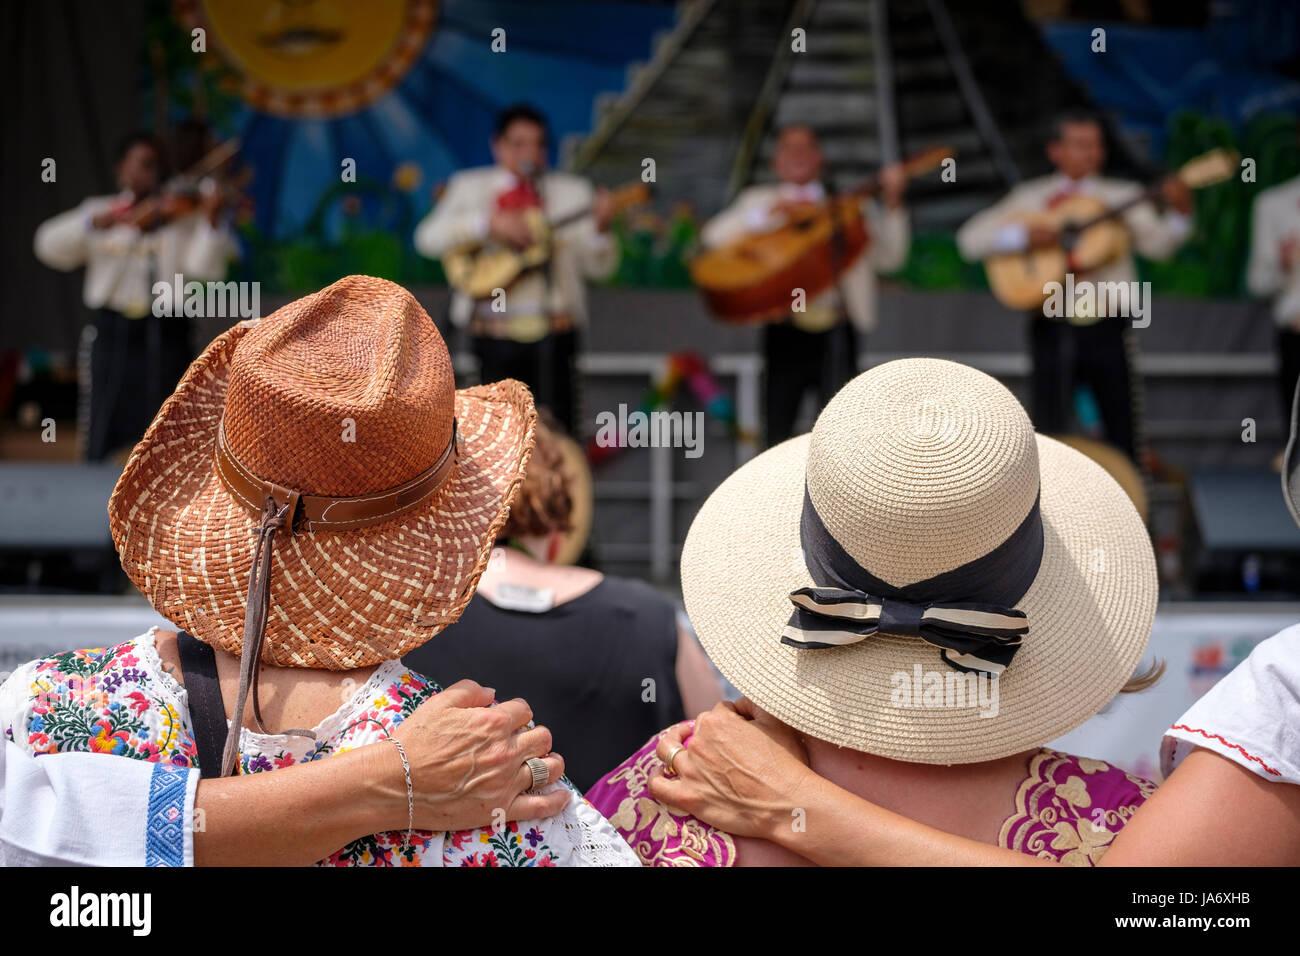 london-ontario-canada-4th-june-2017-fiesta-london!-mexican-festival-JA6XHB.jpg